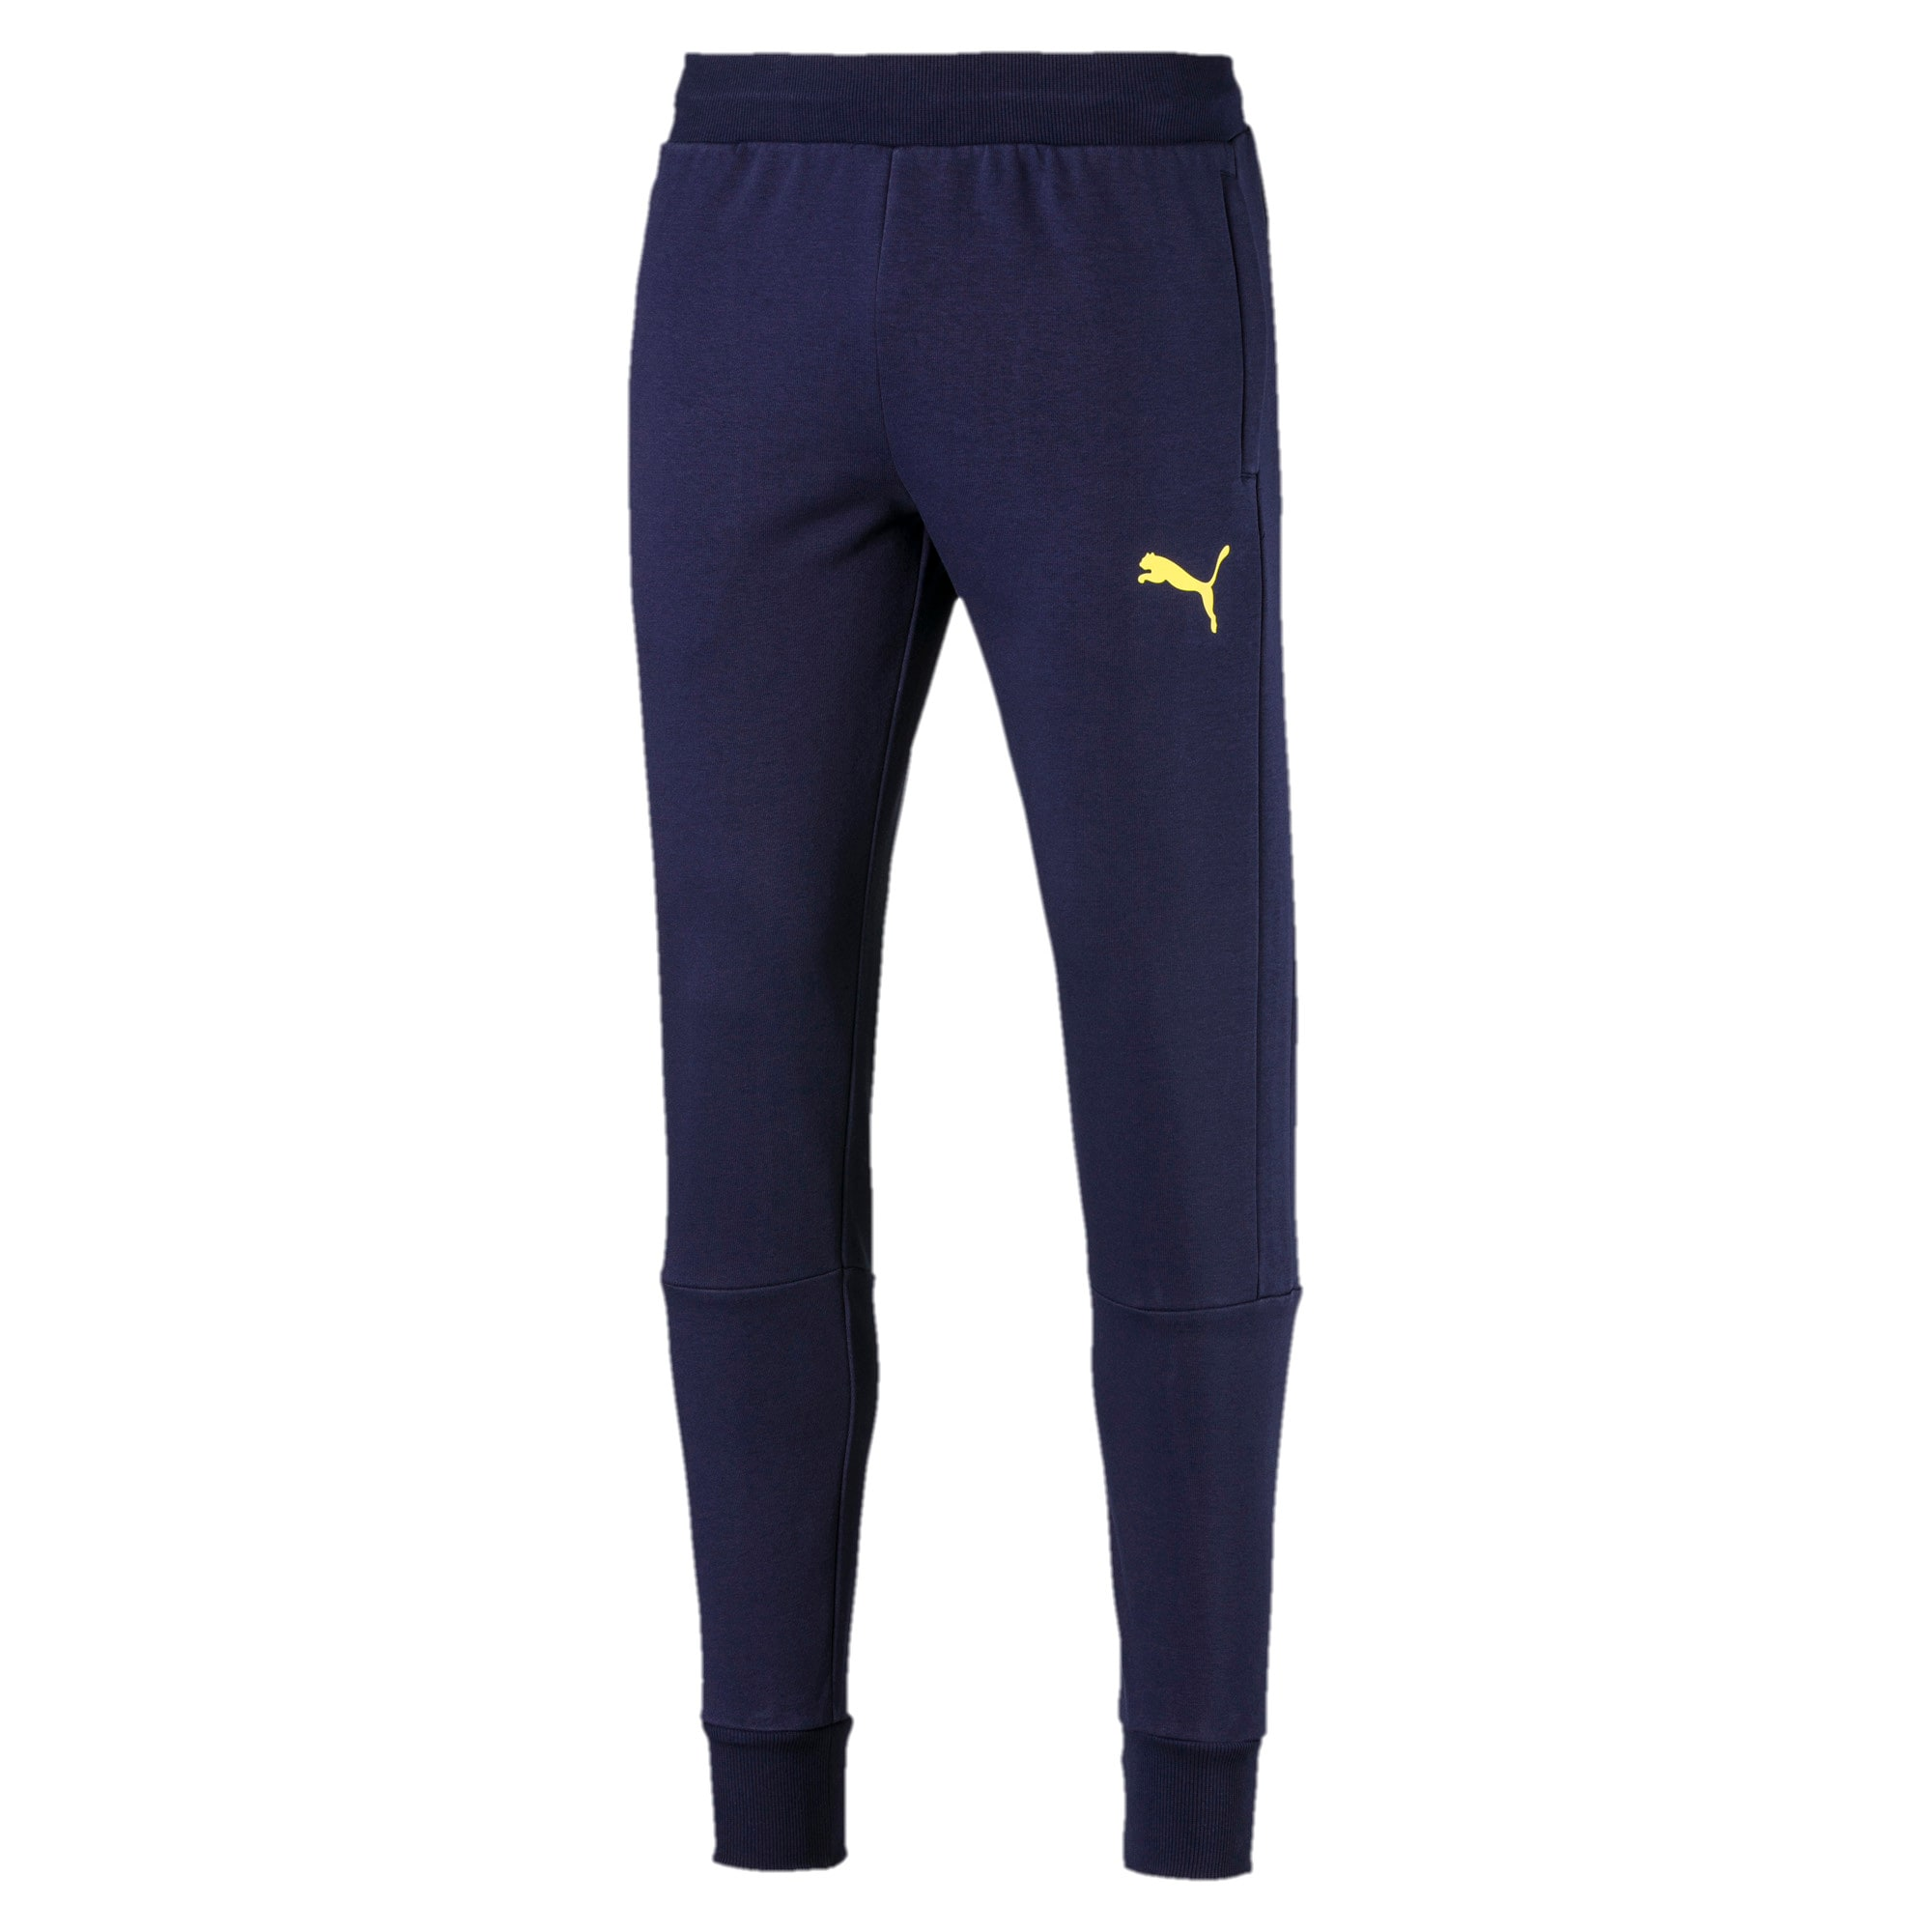 Thumbnail 1 of Modern Sports Pants, Peacoat, medium